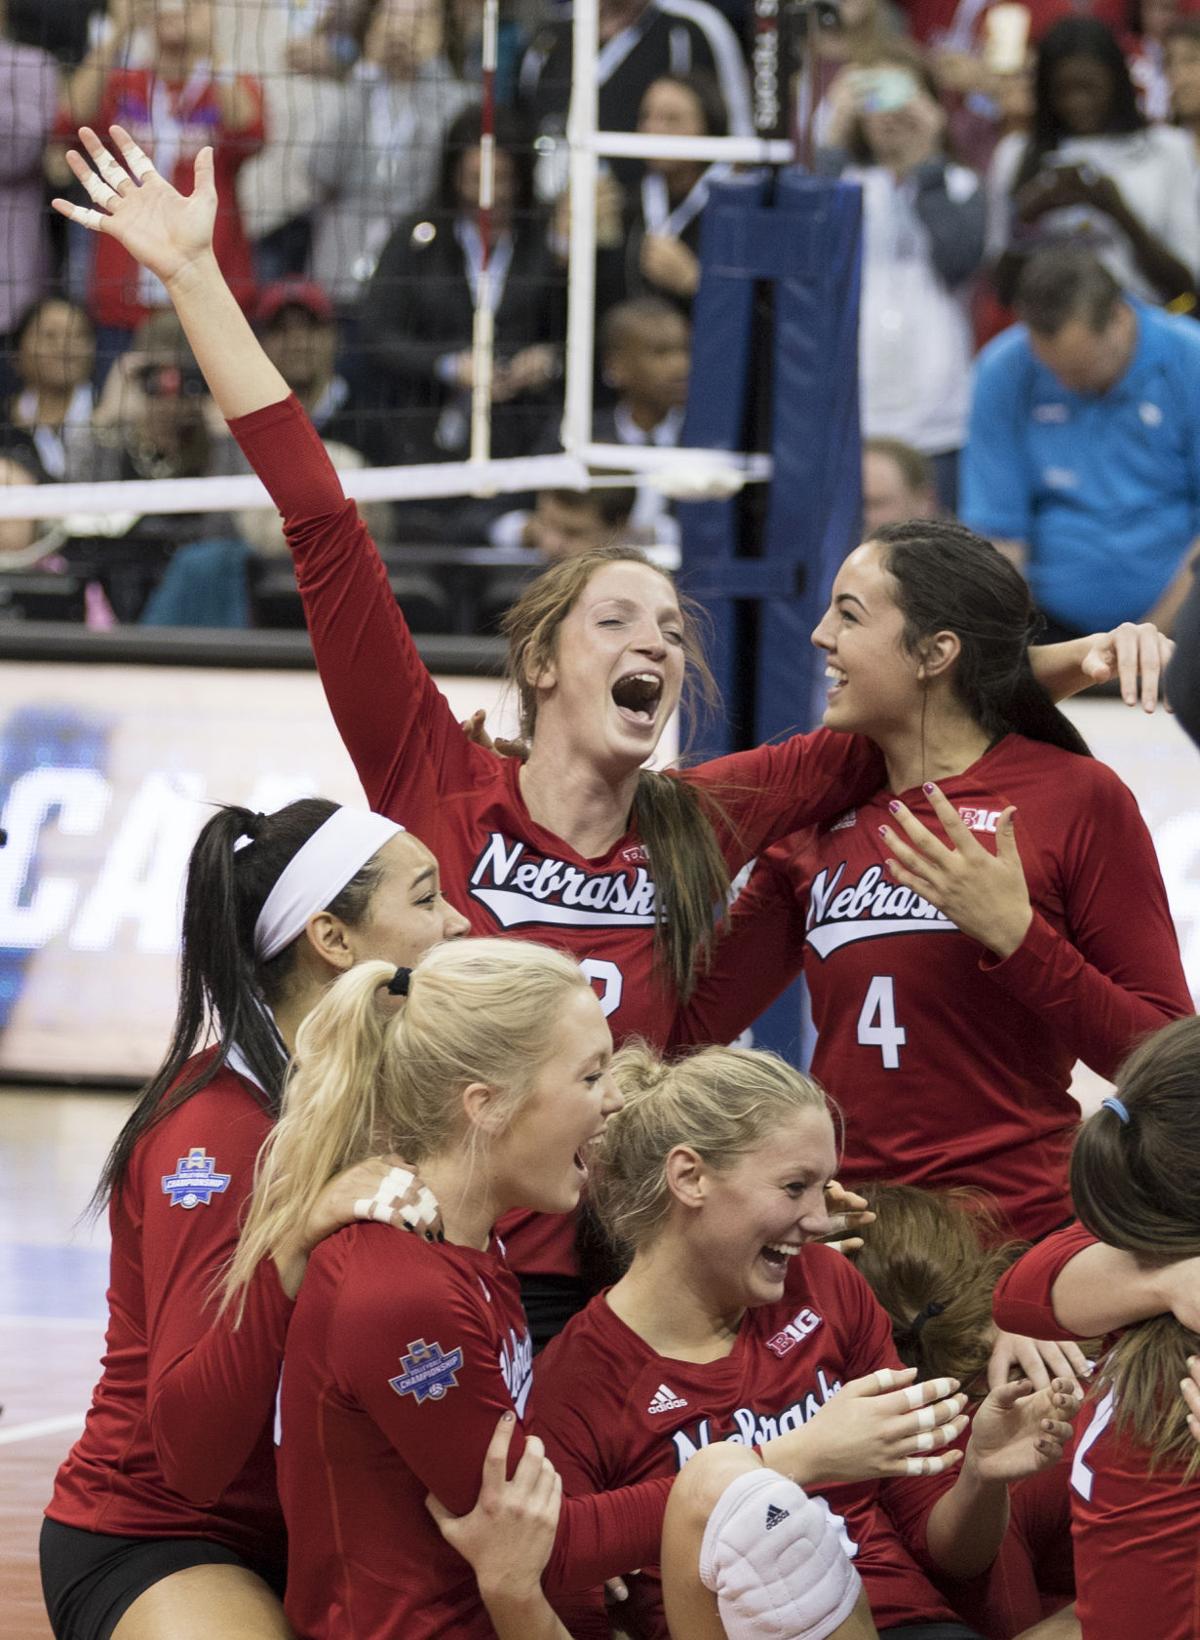 NCAA Volleyball Final, Nebraska vs. Florida, 12/16/17